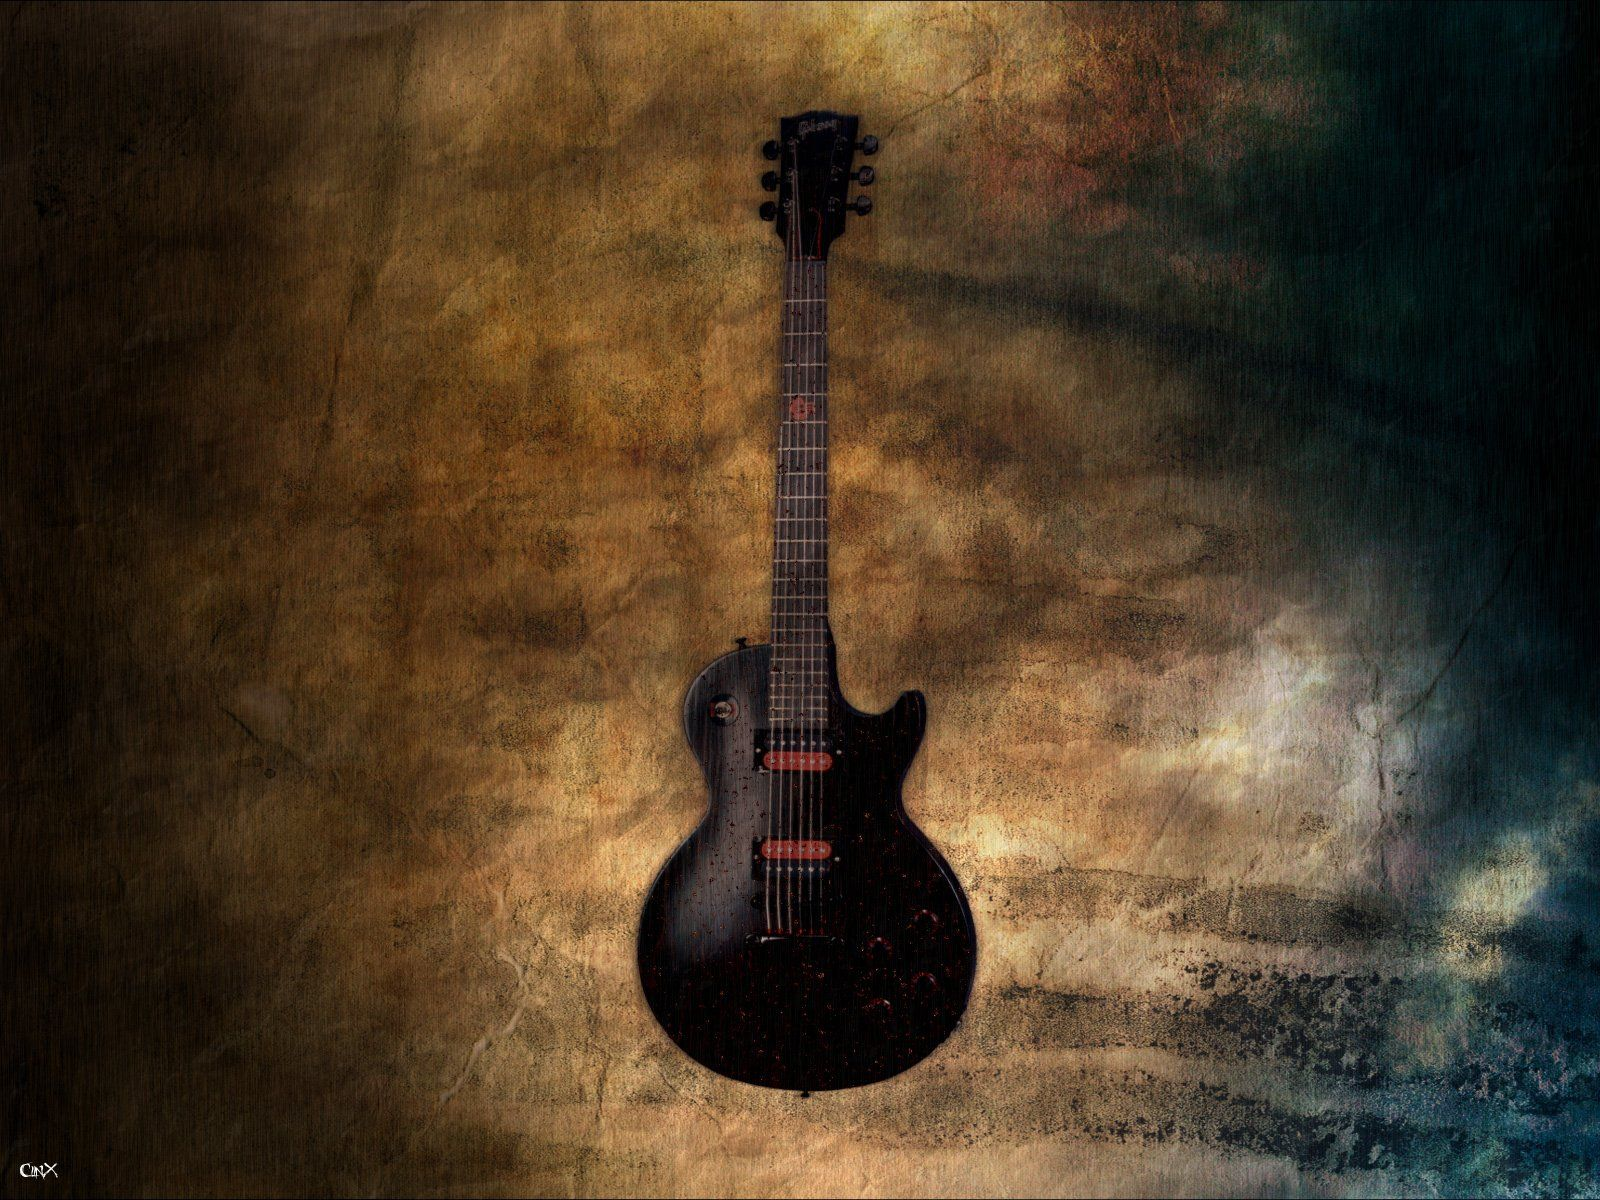 Hd wallpaper guitar - Guitar Hd Wallpapers Backgrounds Wallpaper